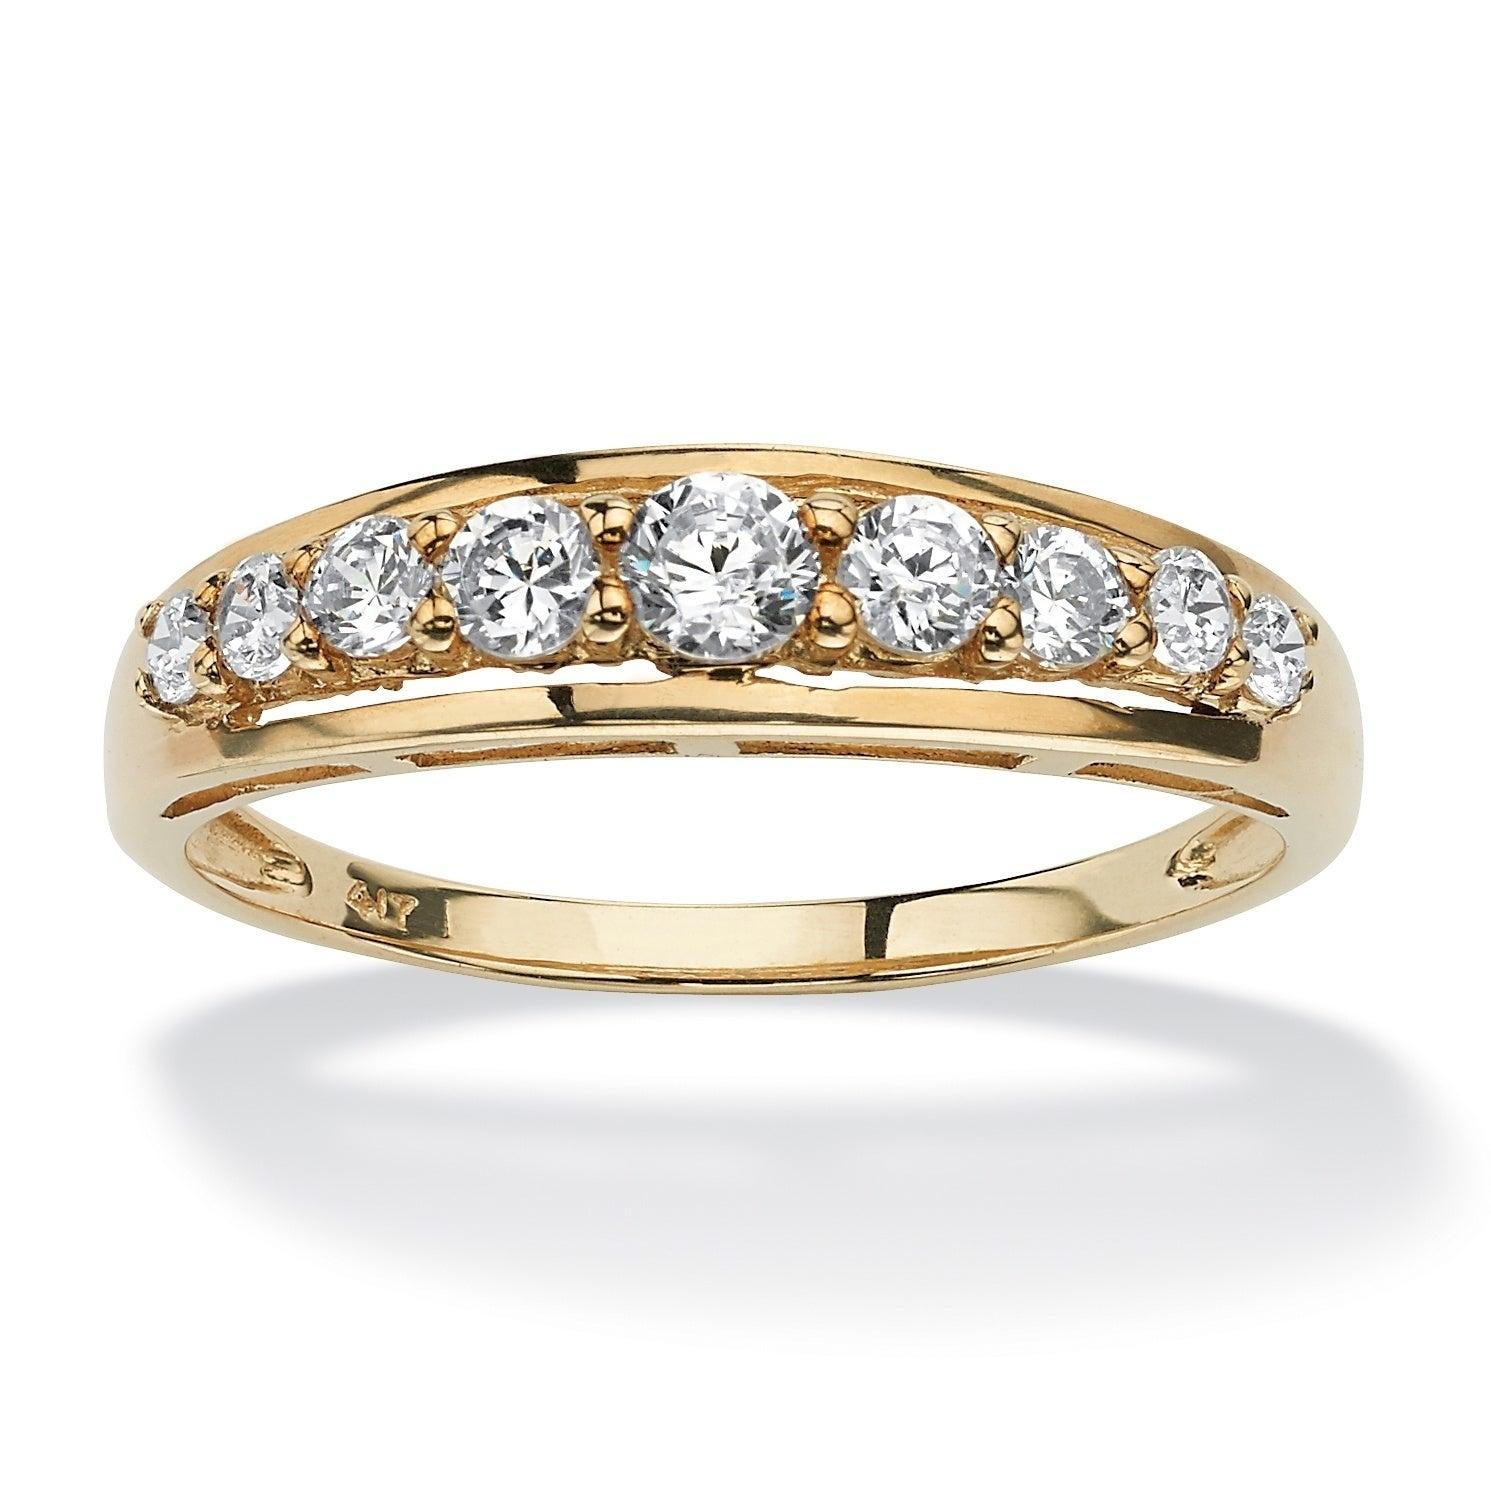 14k White Gold Cubic Zirconia Wedding Band Ring For Men